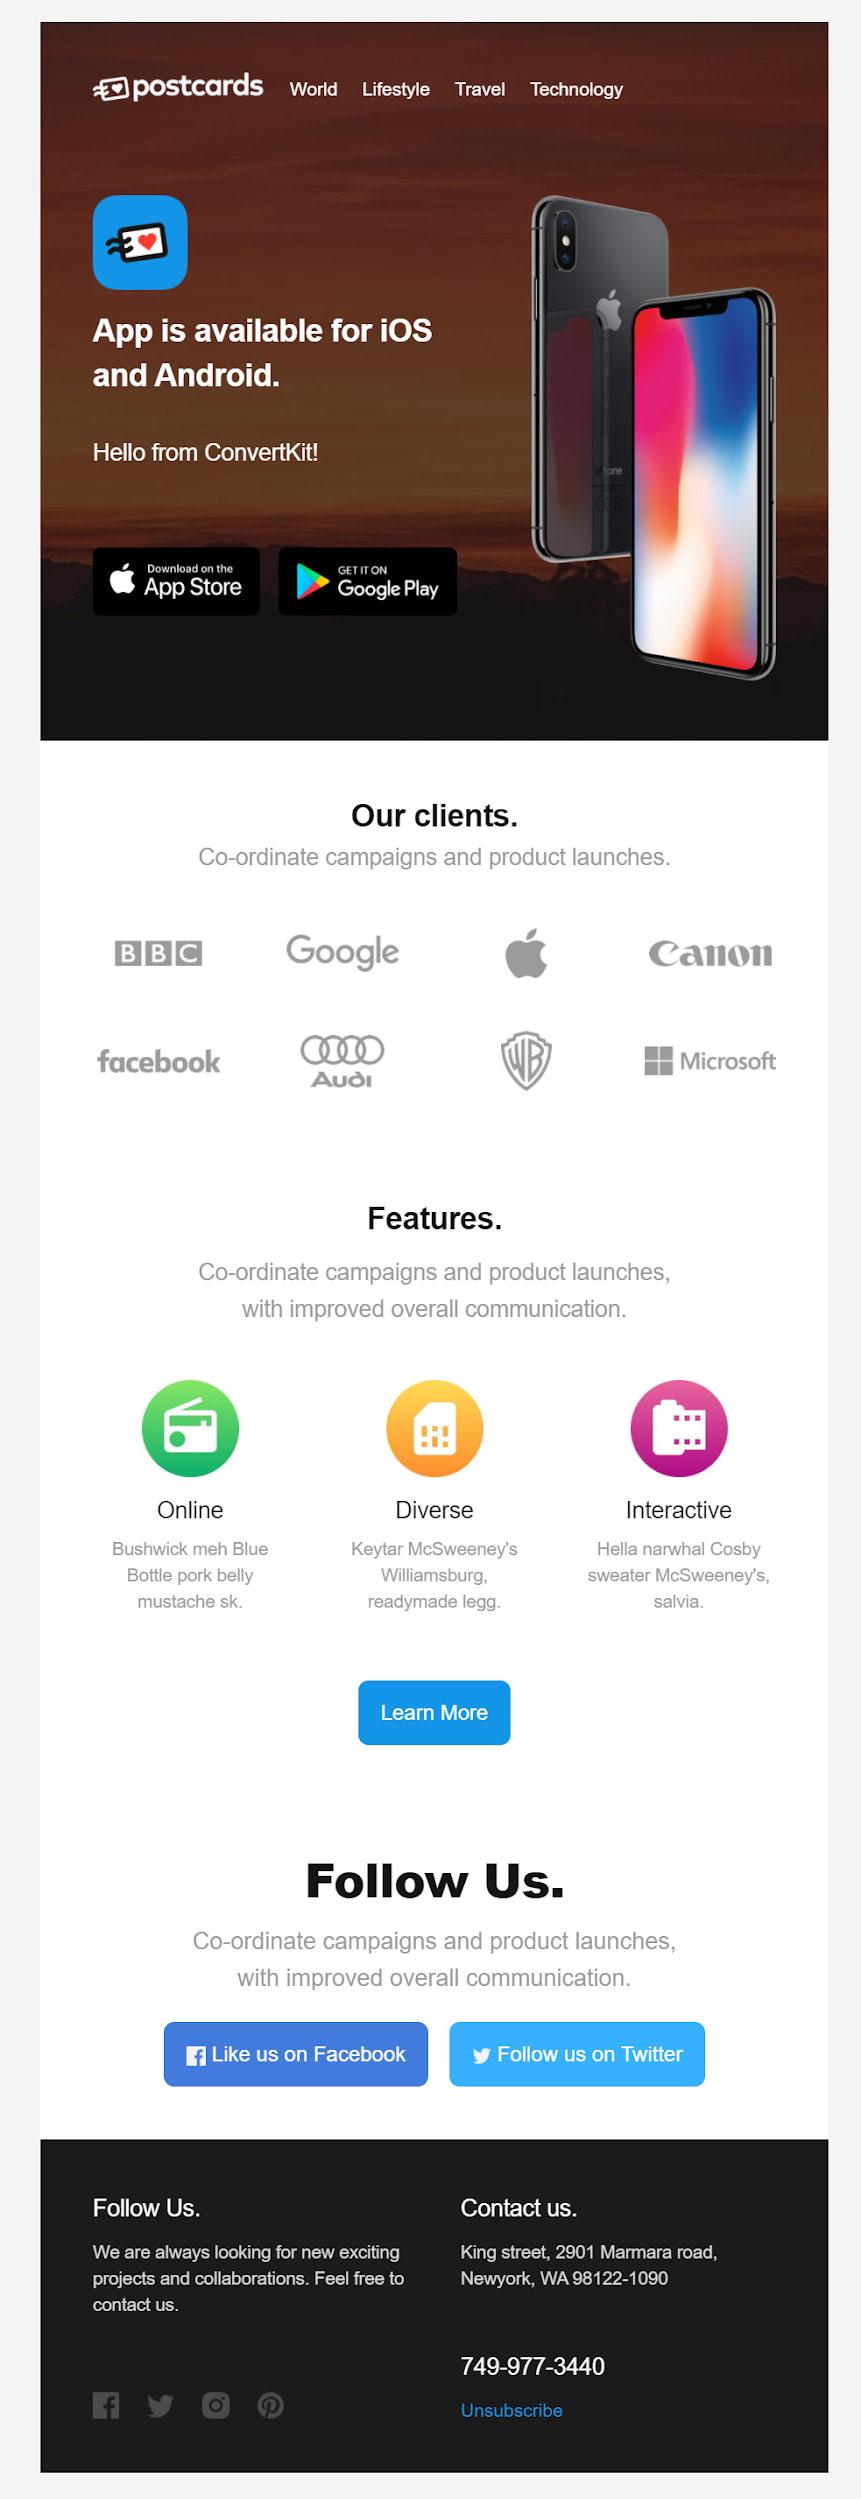 Test email convertkit